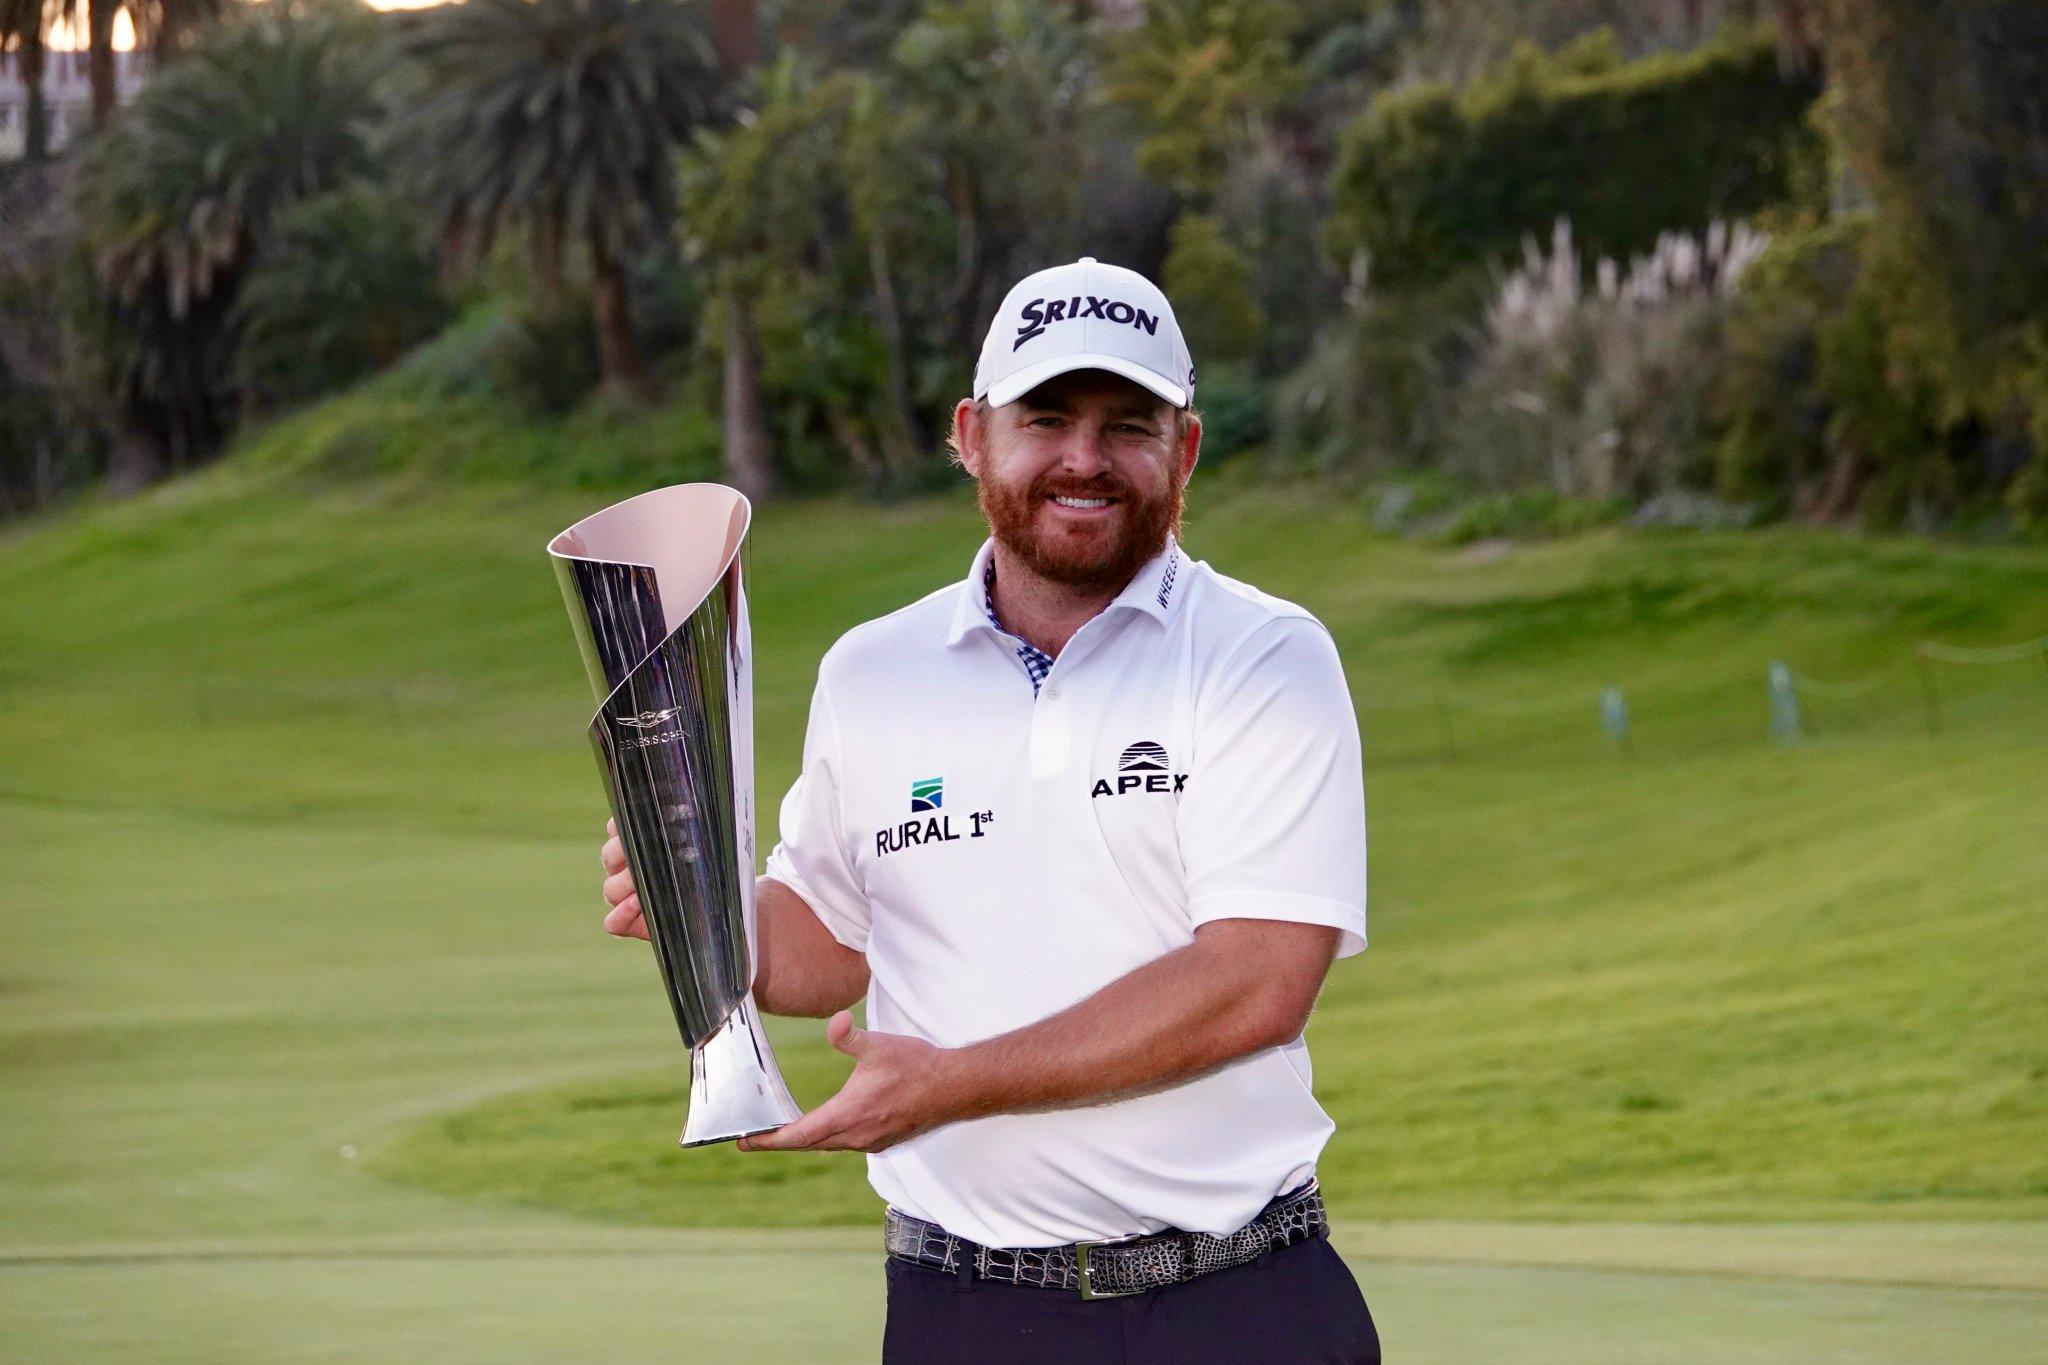 Golf - Tour américain - Genesis Open: J.B. Holmes gagne devant Justin Thomas, Tiger Woods y a cru